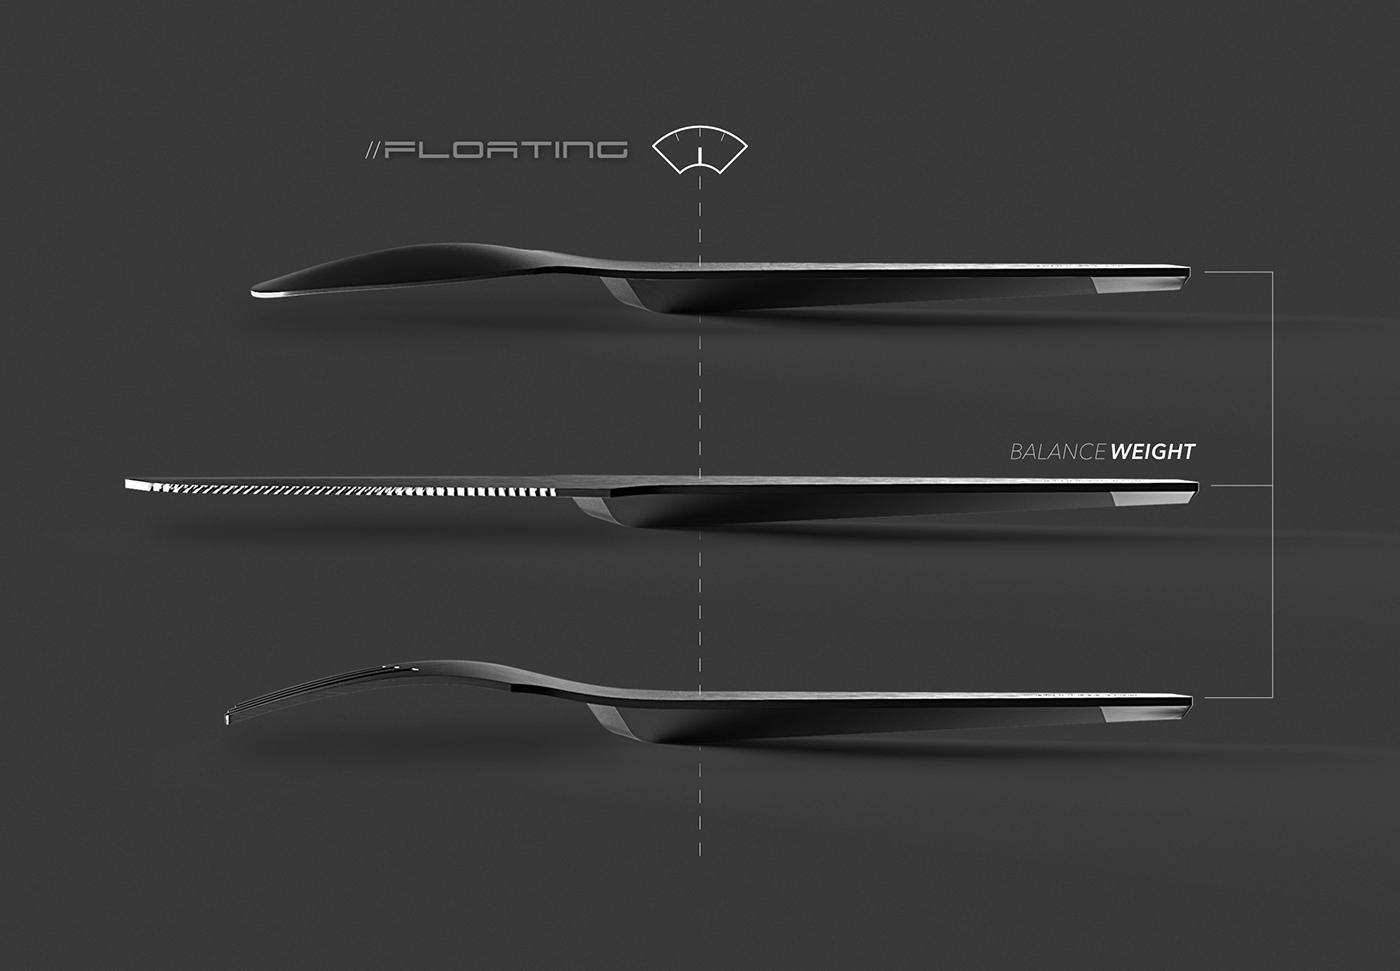 cutlery flatware product design  industrial design  packaging design rendering 3d design cmf Rhinoceros keyshot